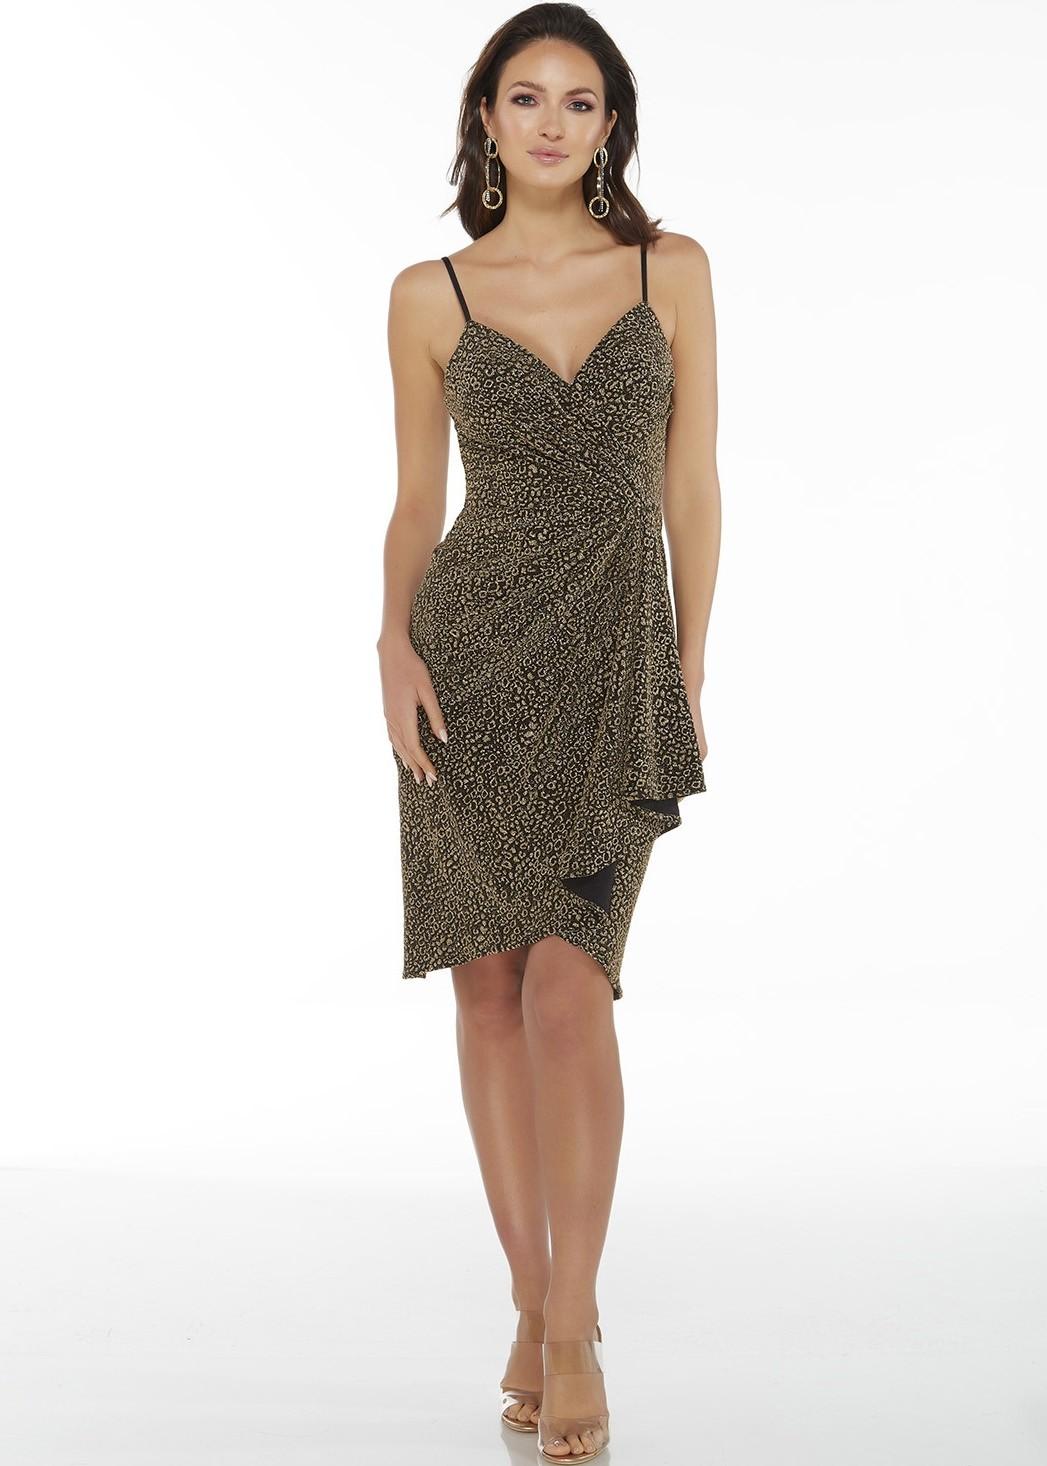 Alyce 27414 Black-Gold Evening Dress